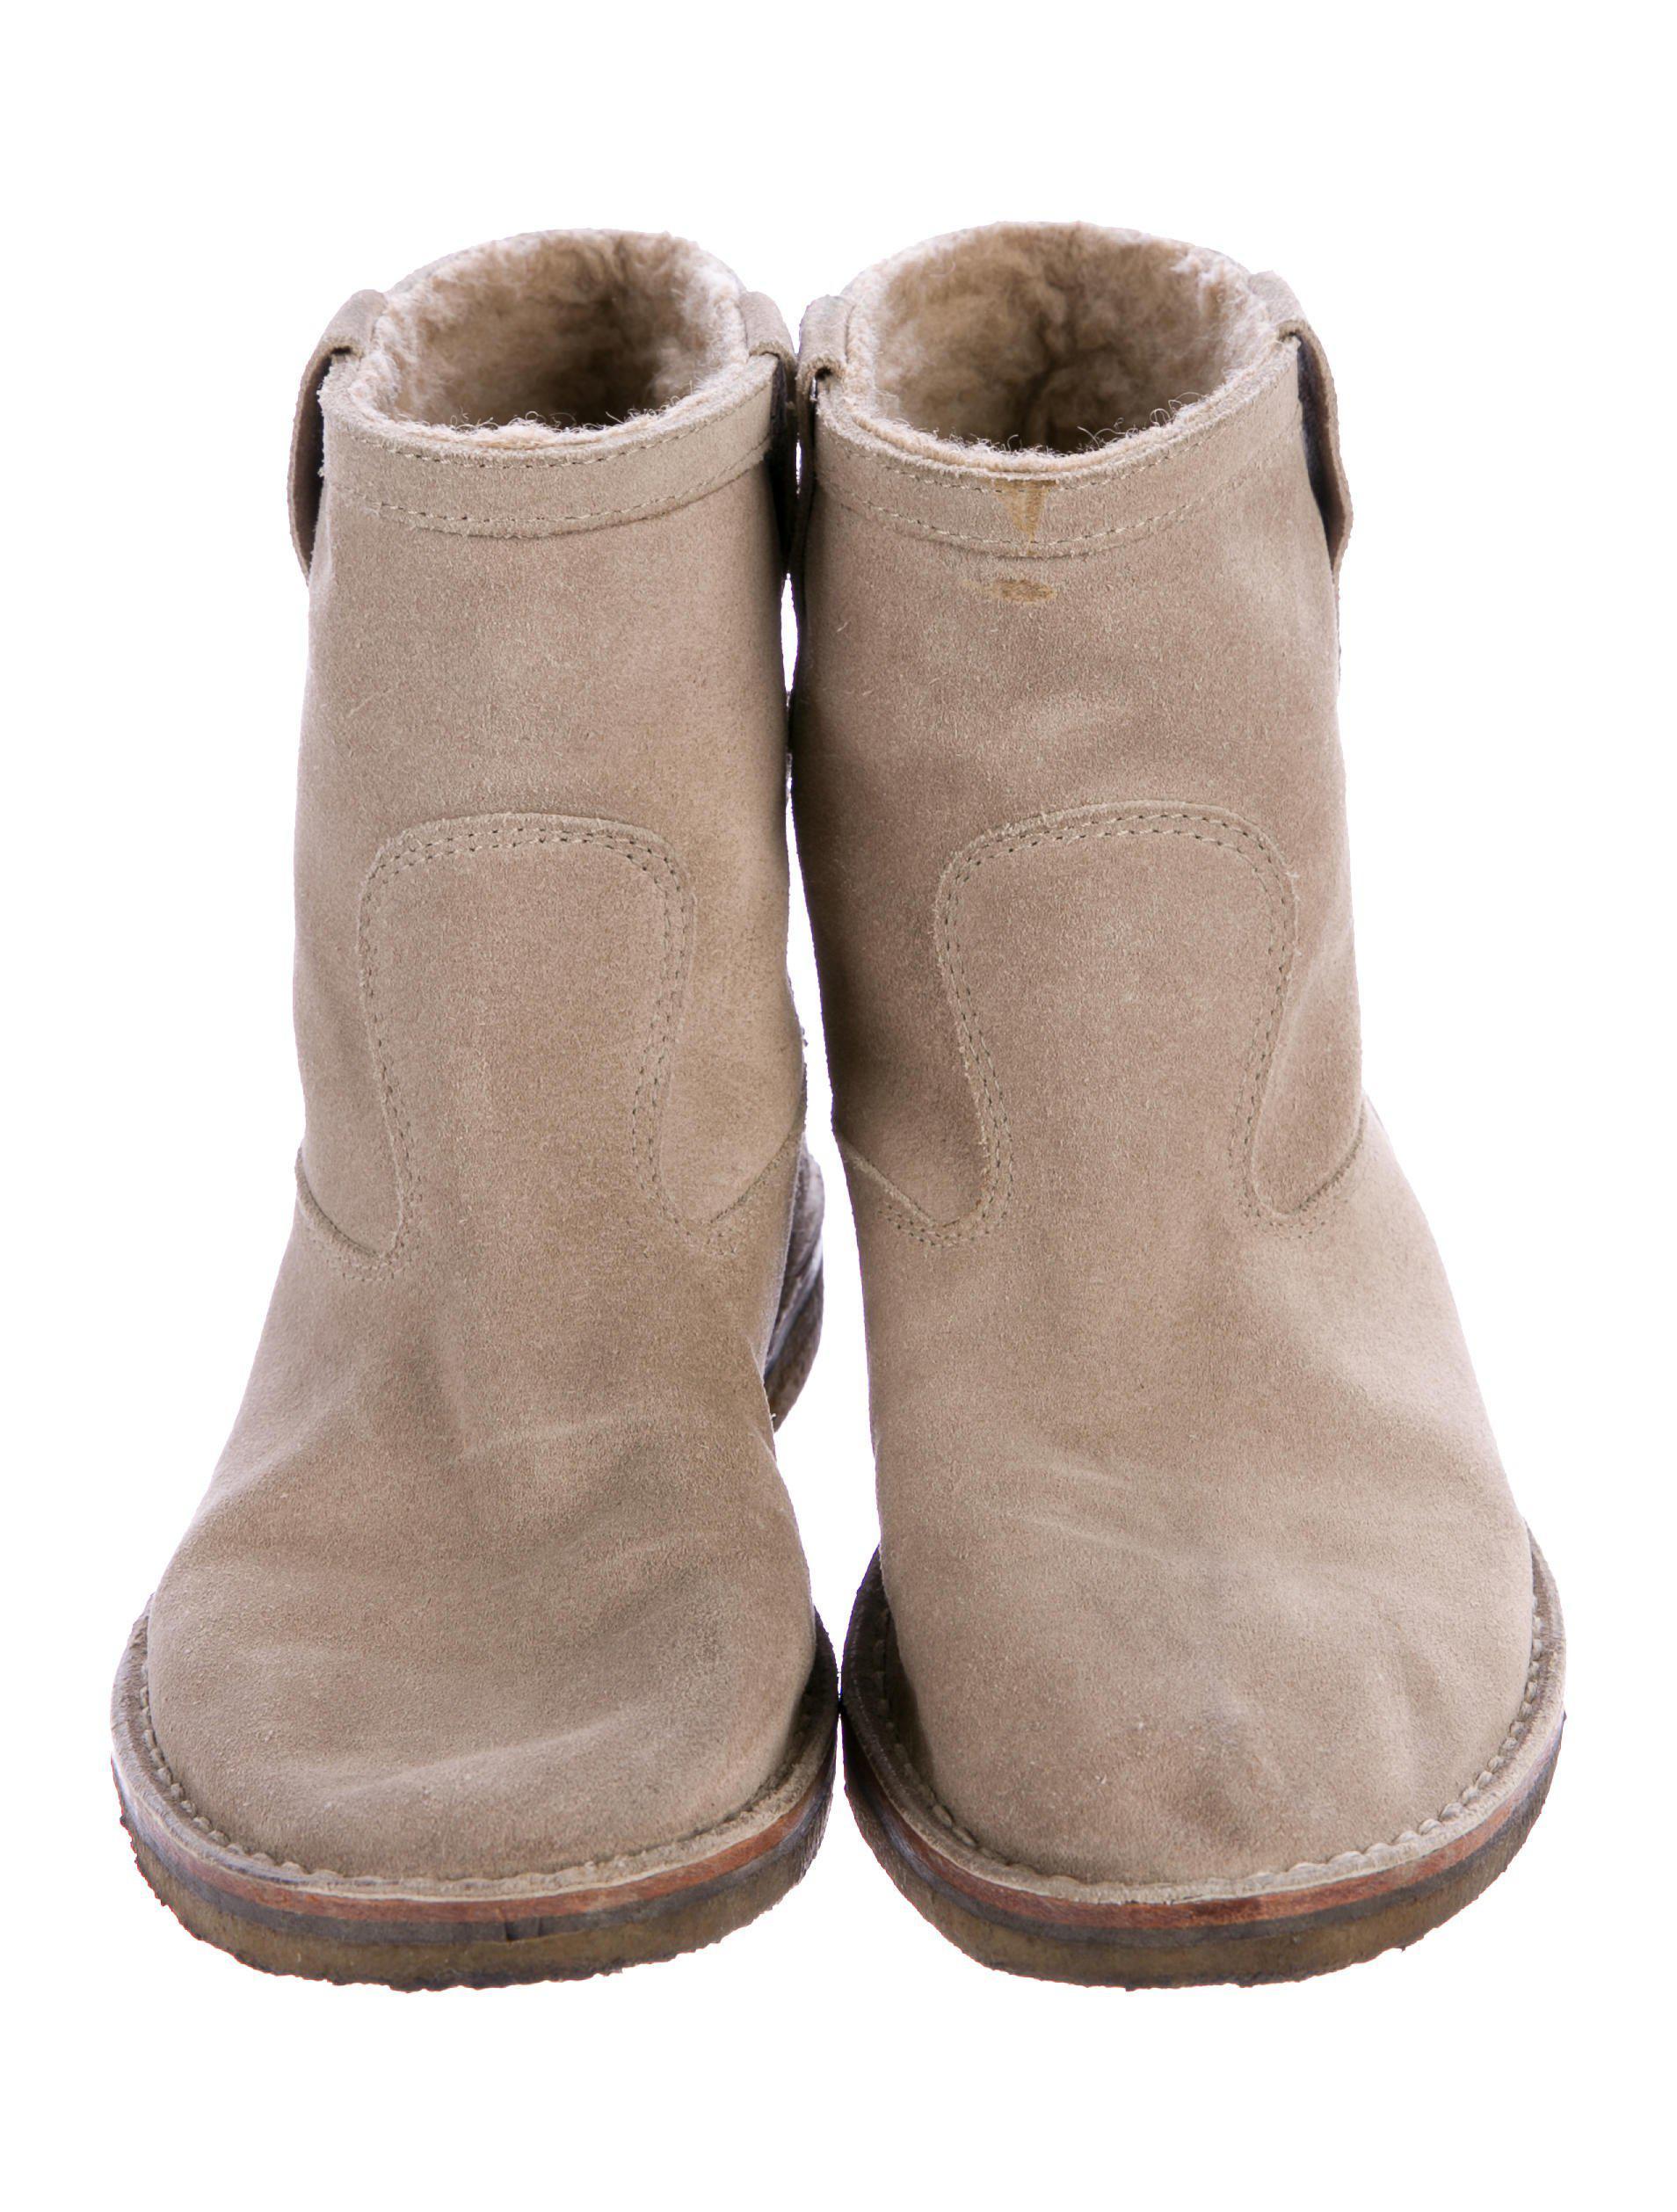 Golden Goose Suede Mid-Calf Boots latest cheap online visa payment choice sale geniue stockist uNmDE